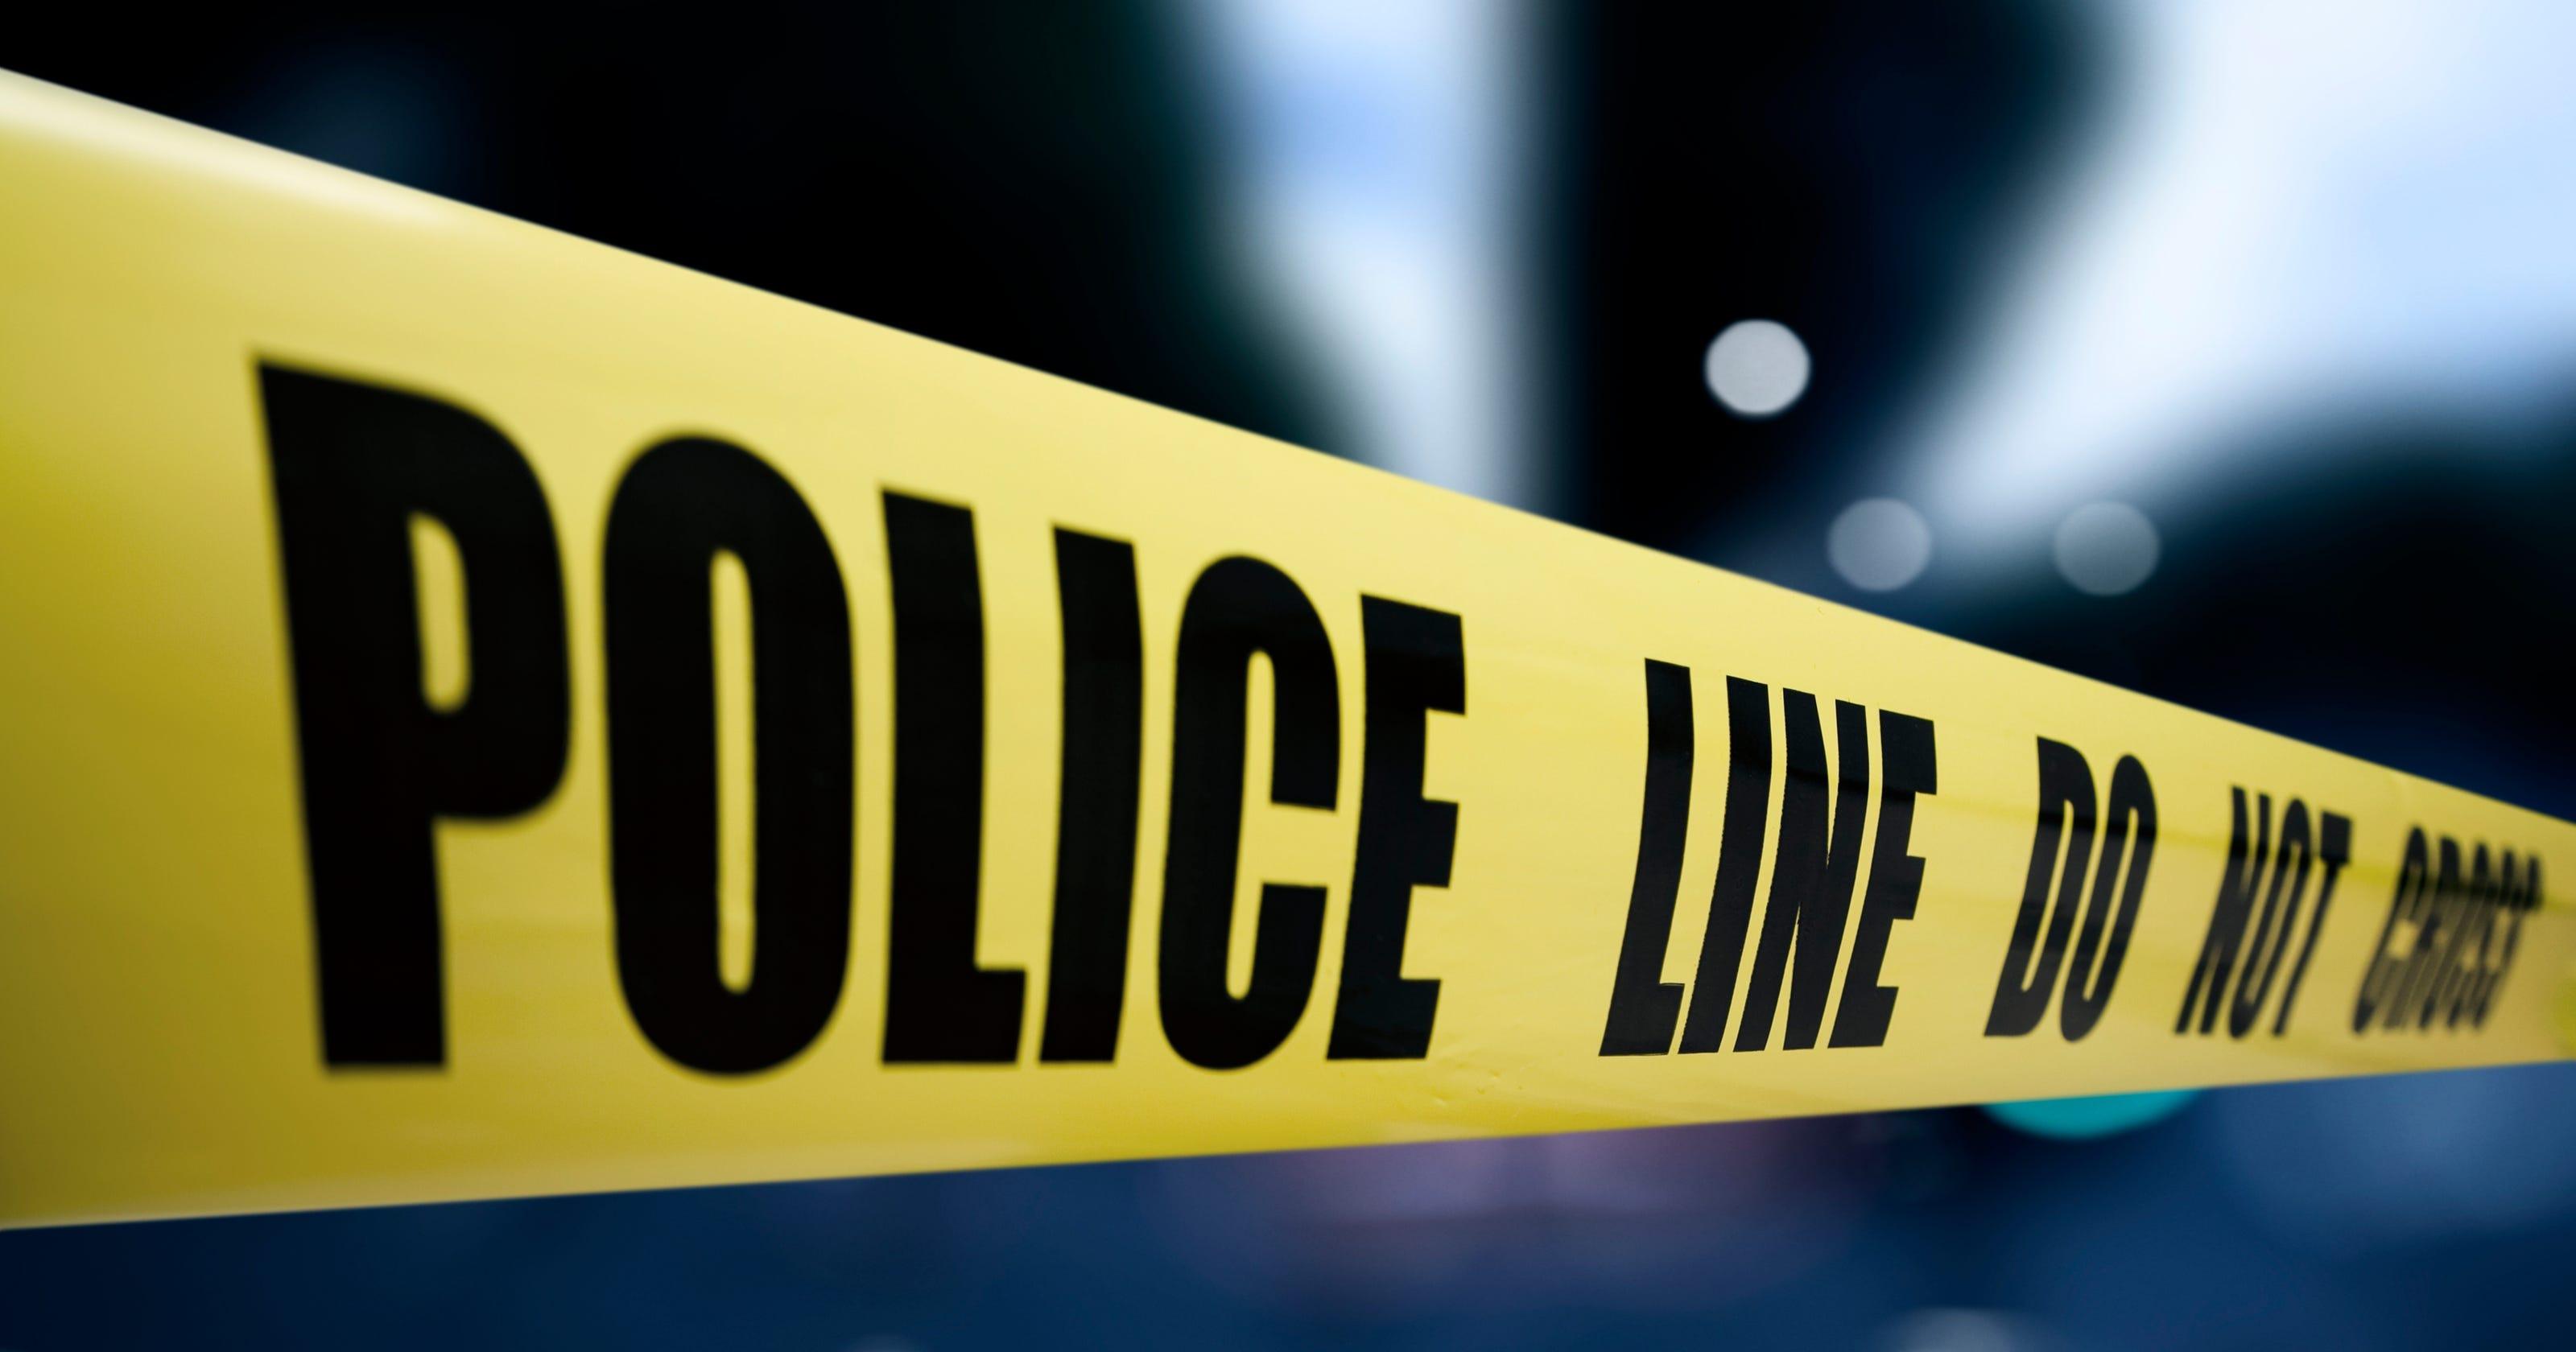 Body found behind BJ's near Elsmere